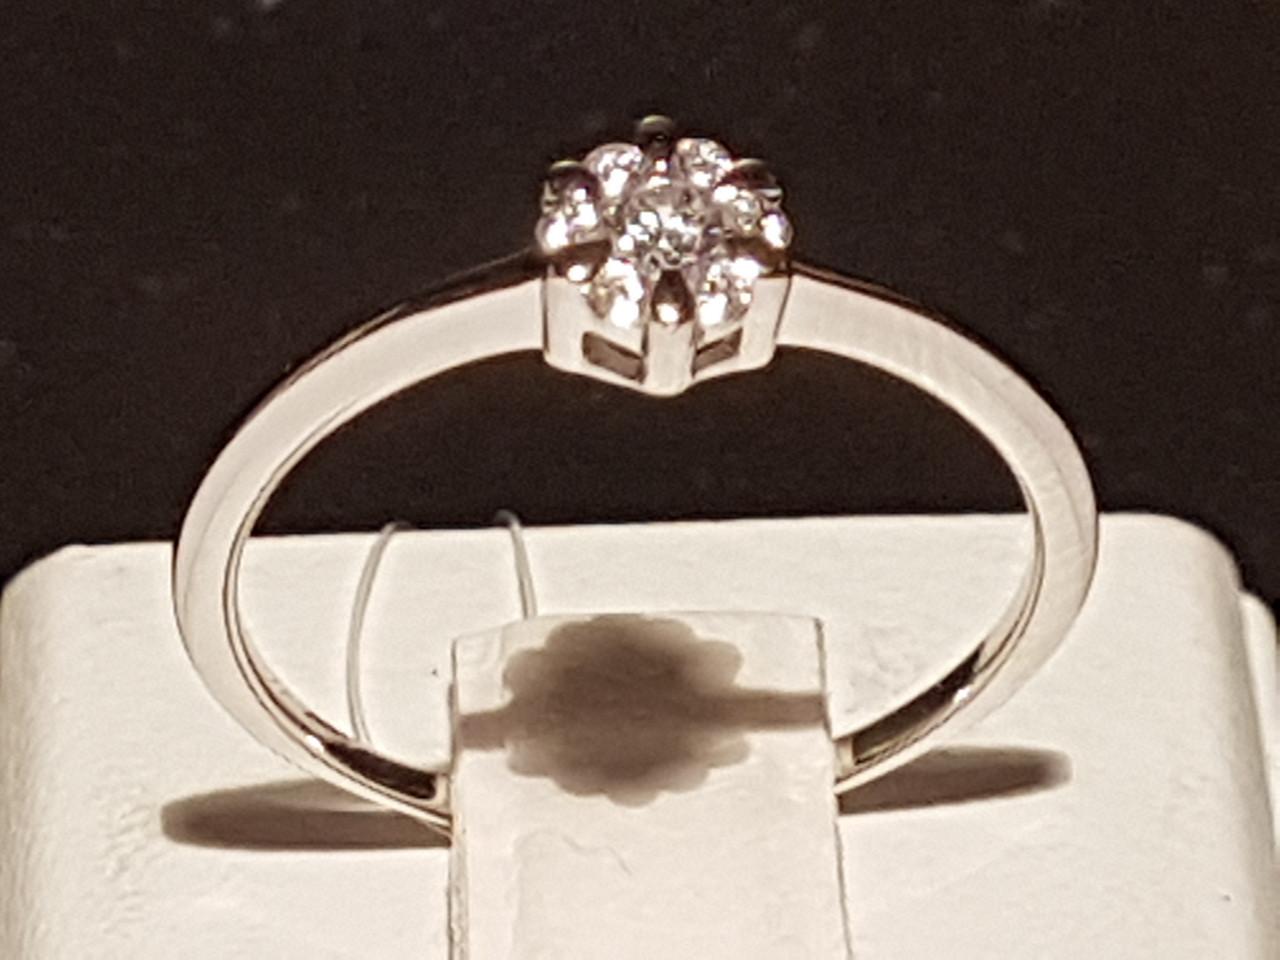 Серебряное кольцо с фианитами. Артикул 901-00689